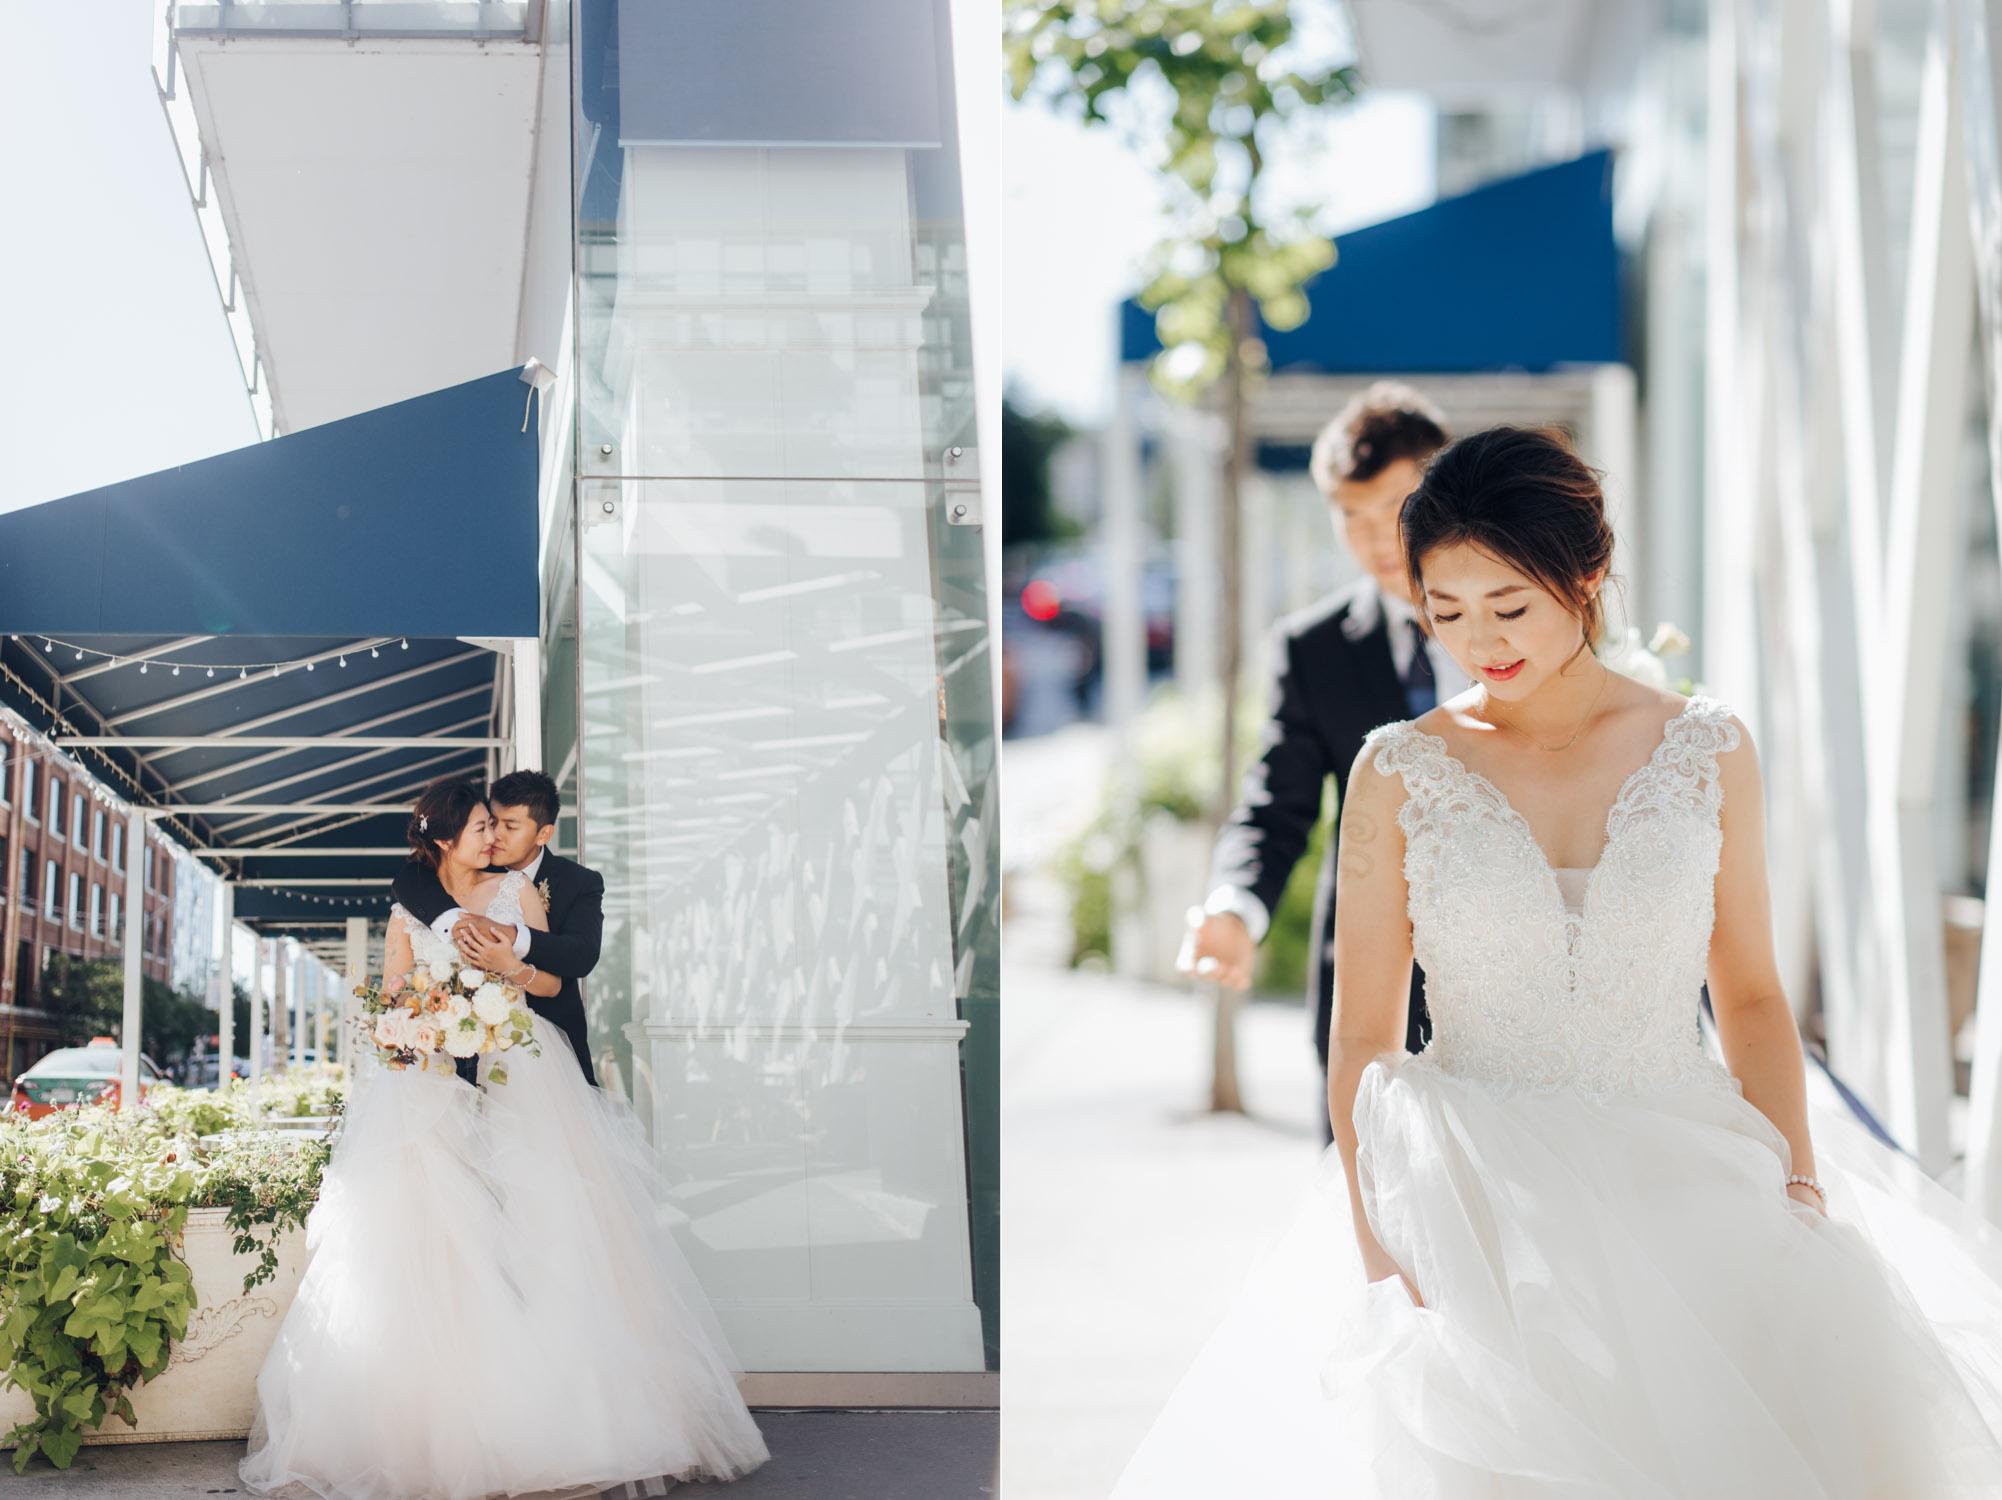 Toronto Colette grand cafe Wedding Bride and Groom Portrait